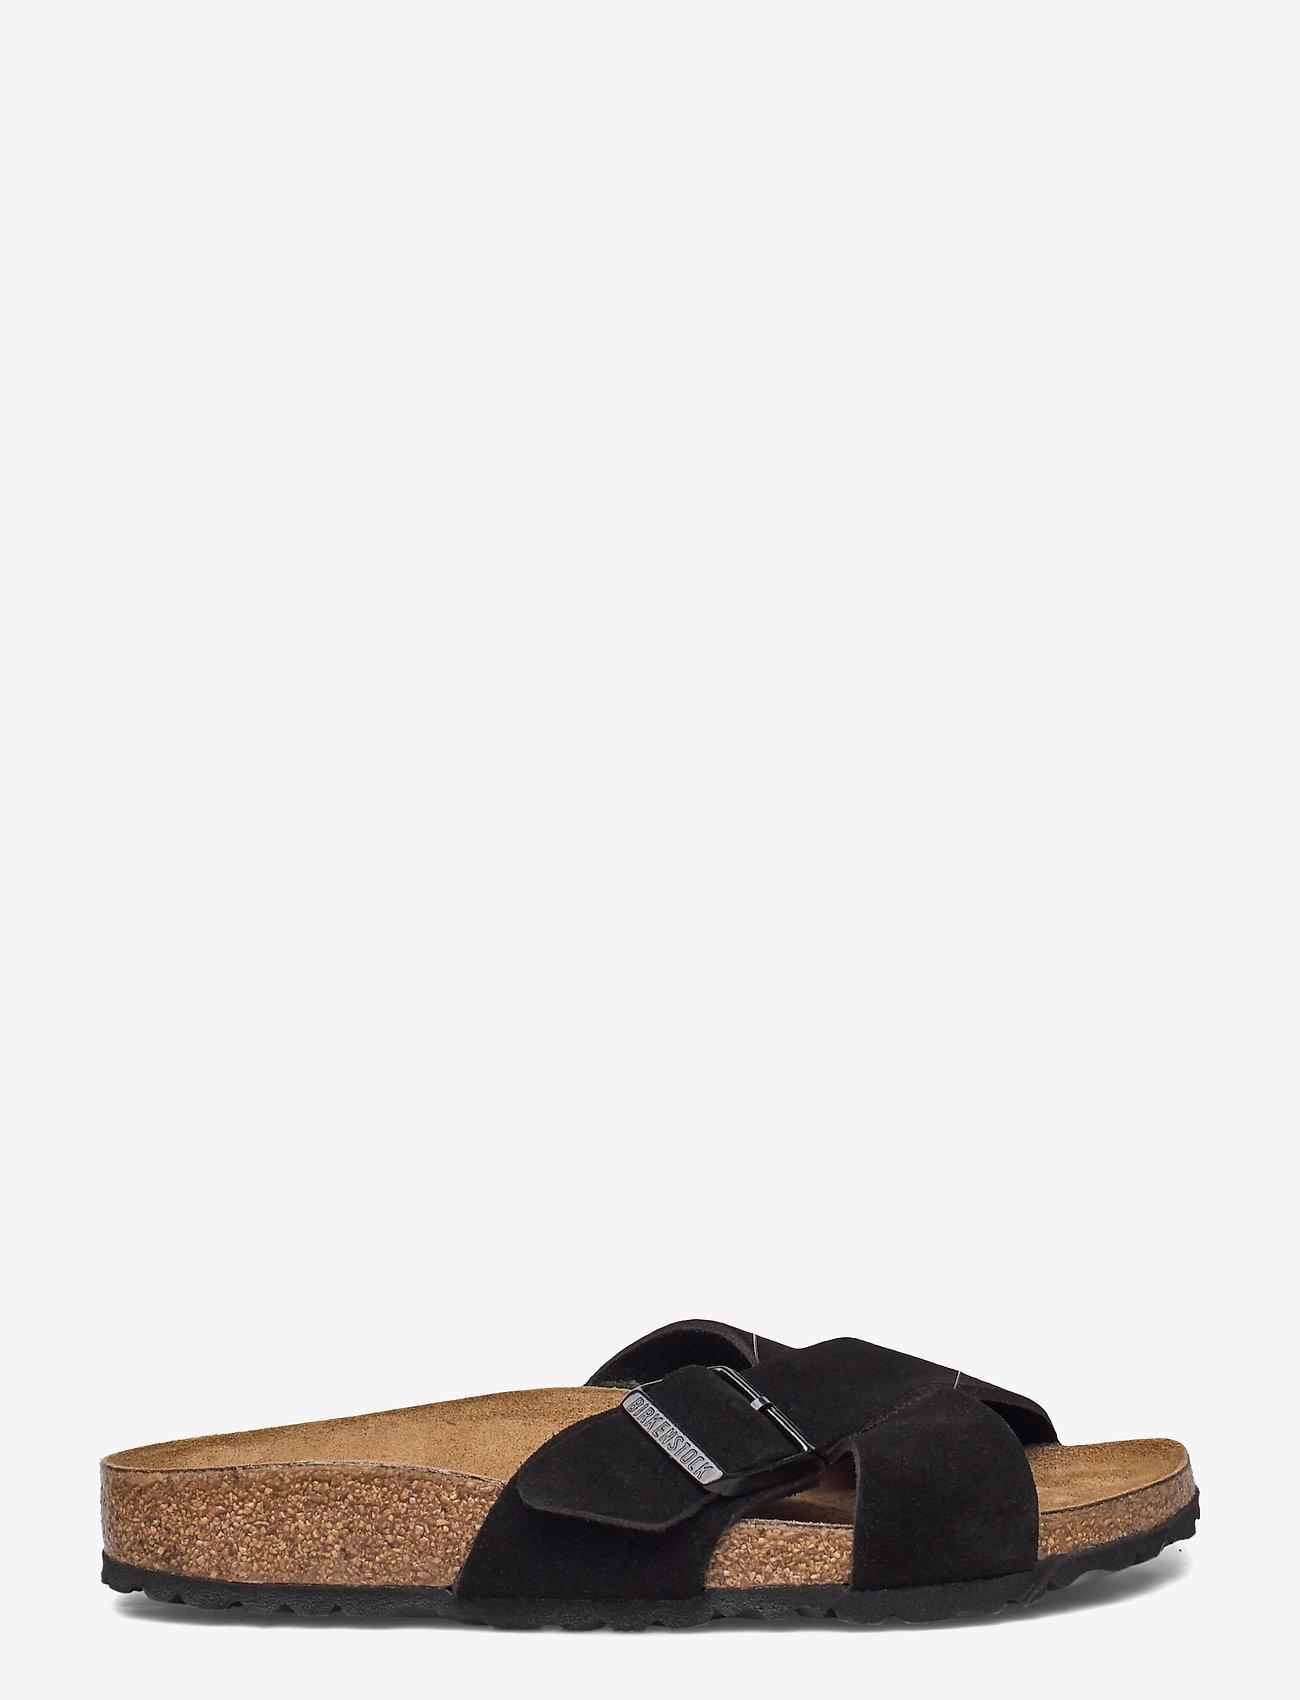 Birkenstock - Siena - flade sandaler - black - 1